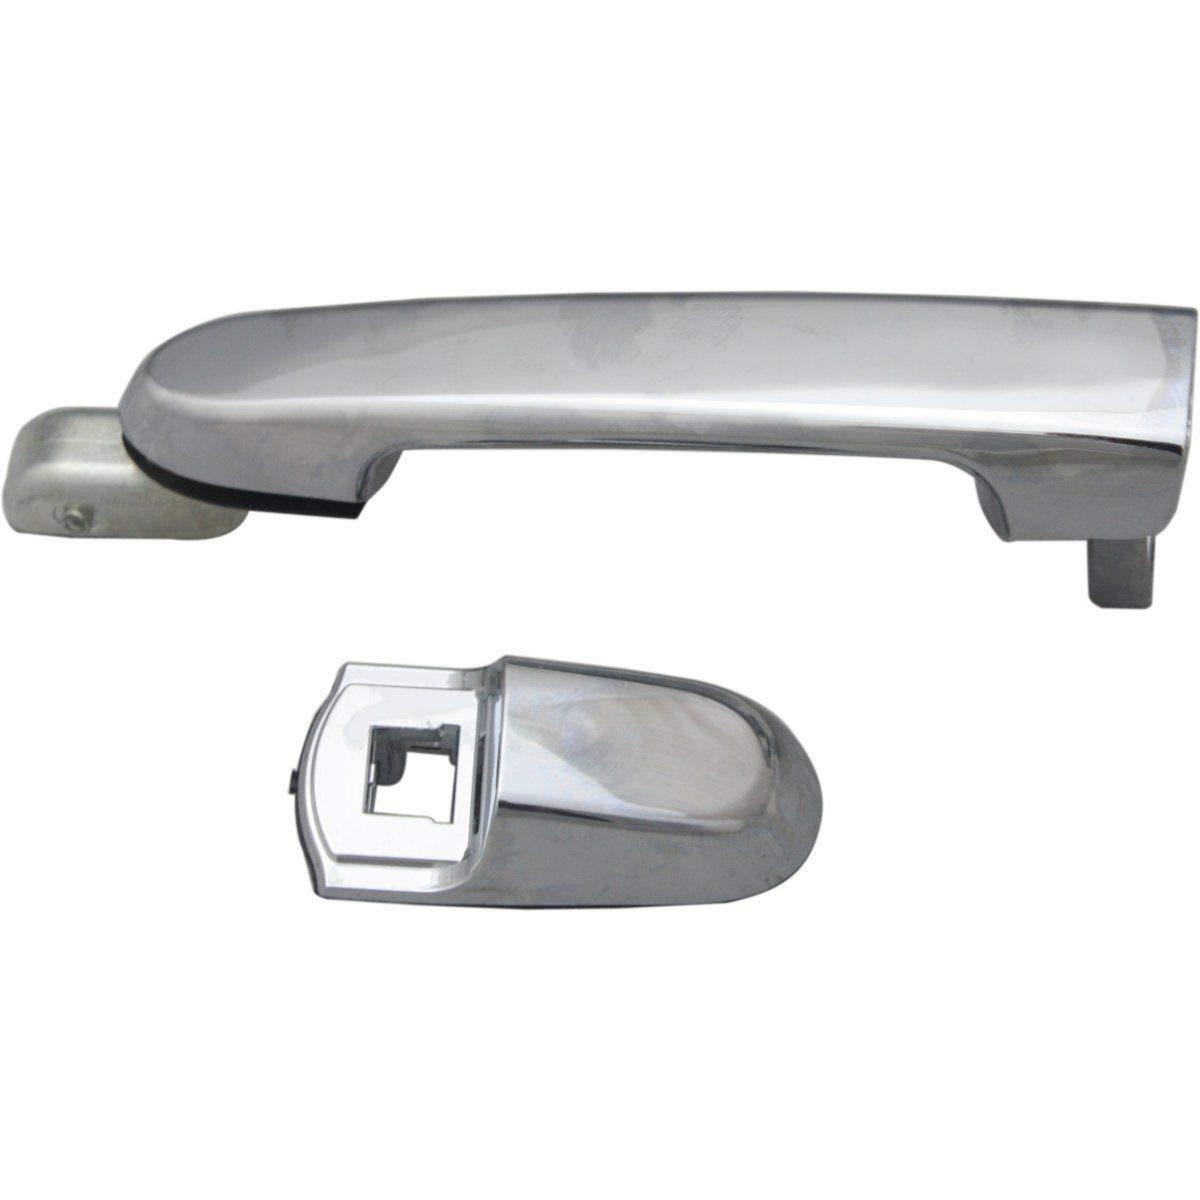 2Pcs Rear Pair Exterior Door Handle Left Right For Hyundai Accent 2006 2010